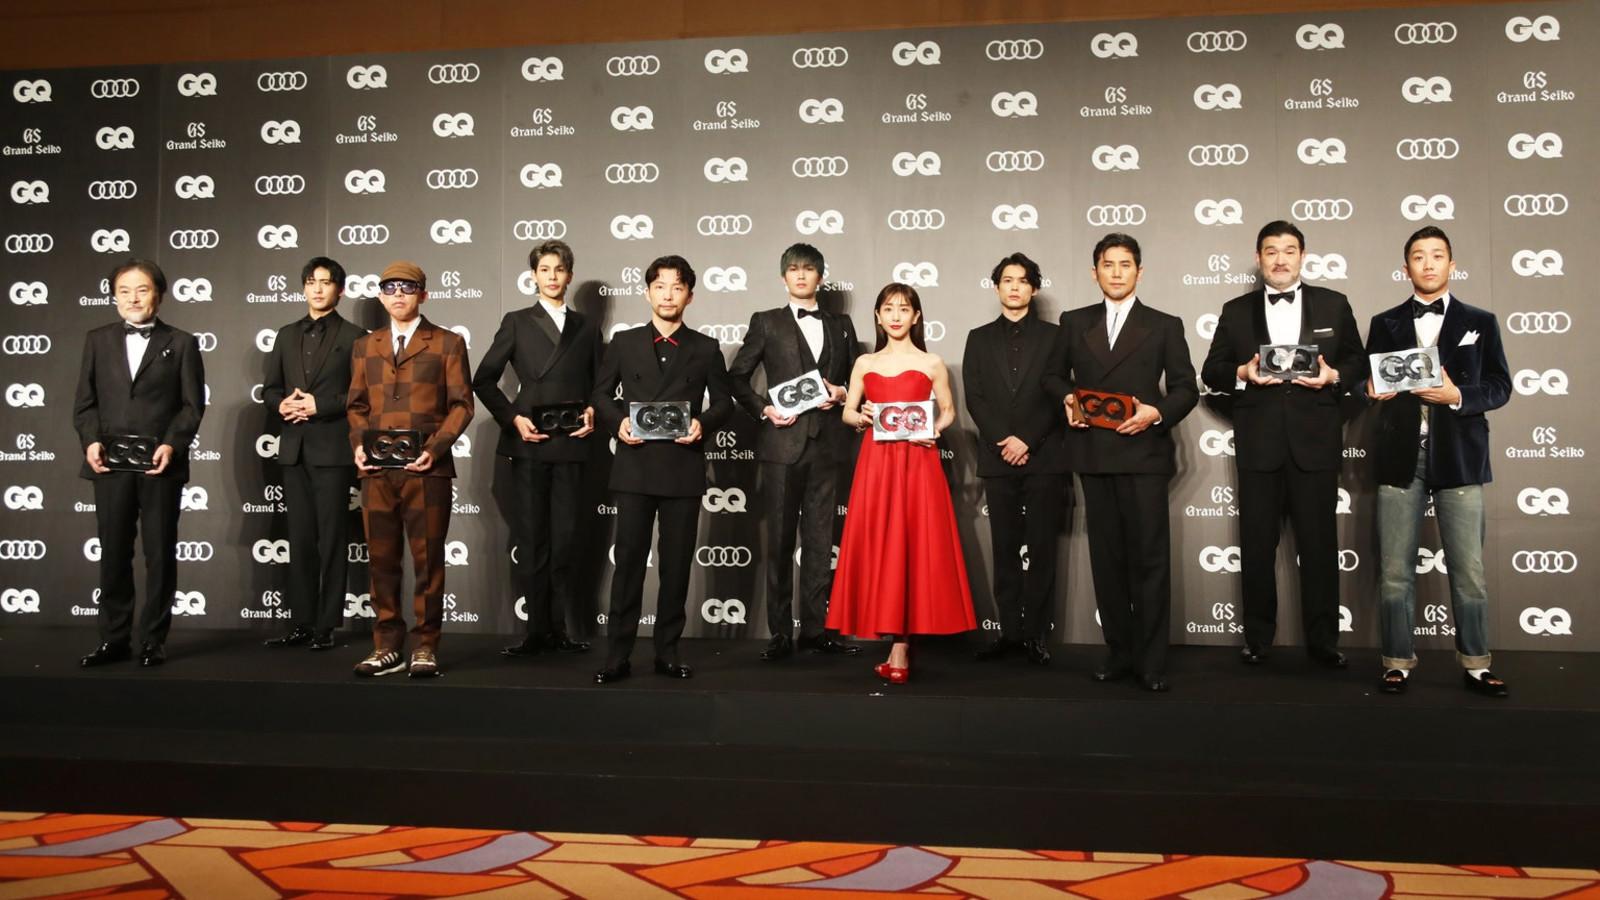 gq-moty-1 - Akihiro Tsue - Japan - GQ MOTY